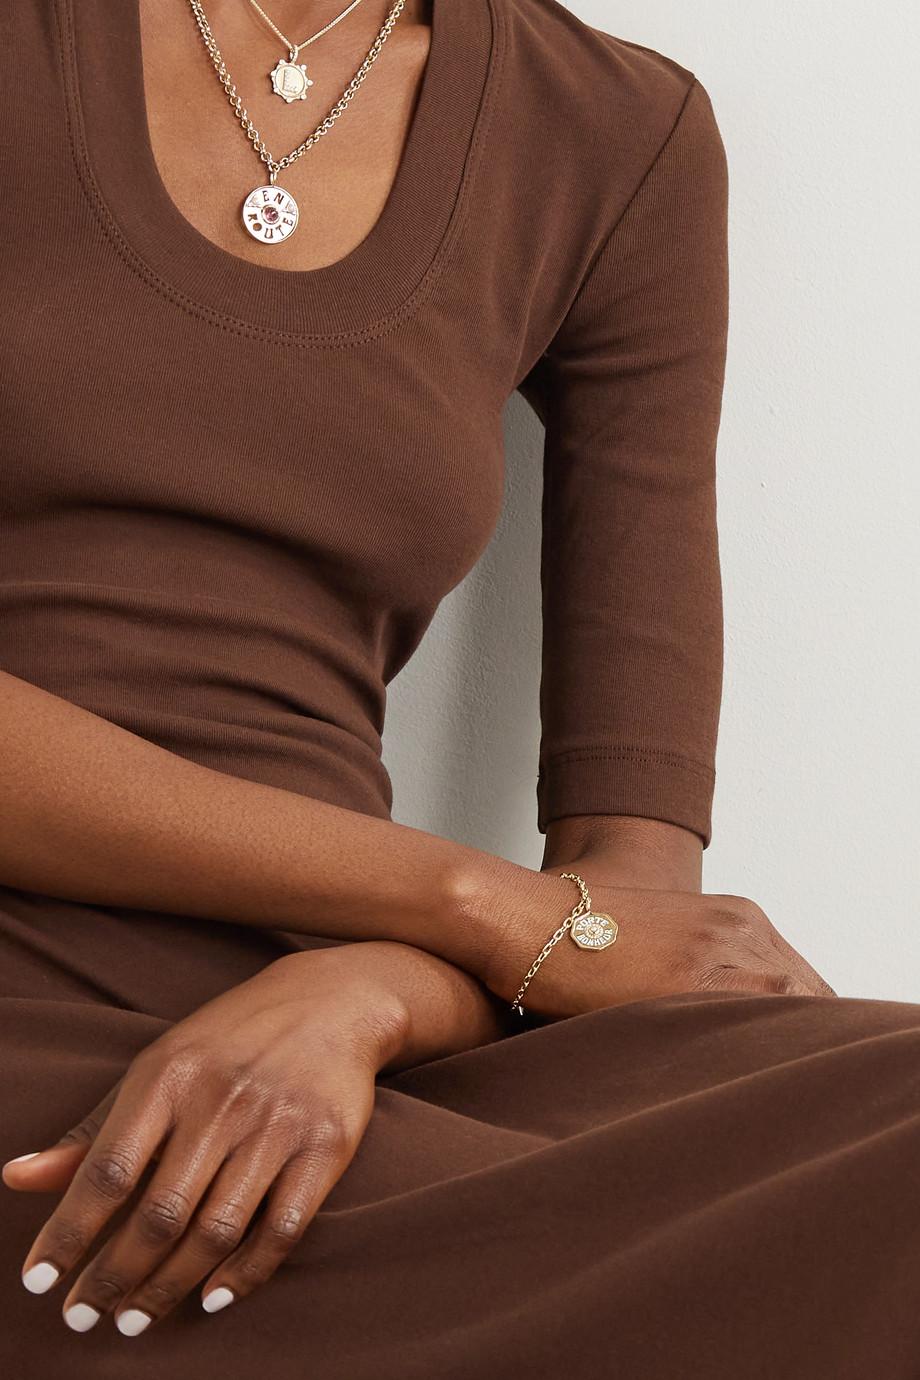 Marlo Laz Mini Porte Bonheur Coin 14-karat gold, enamel, diamond and pearl bracelet